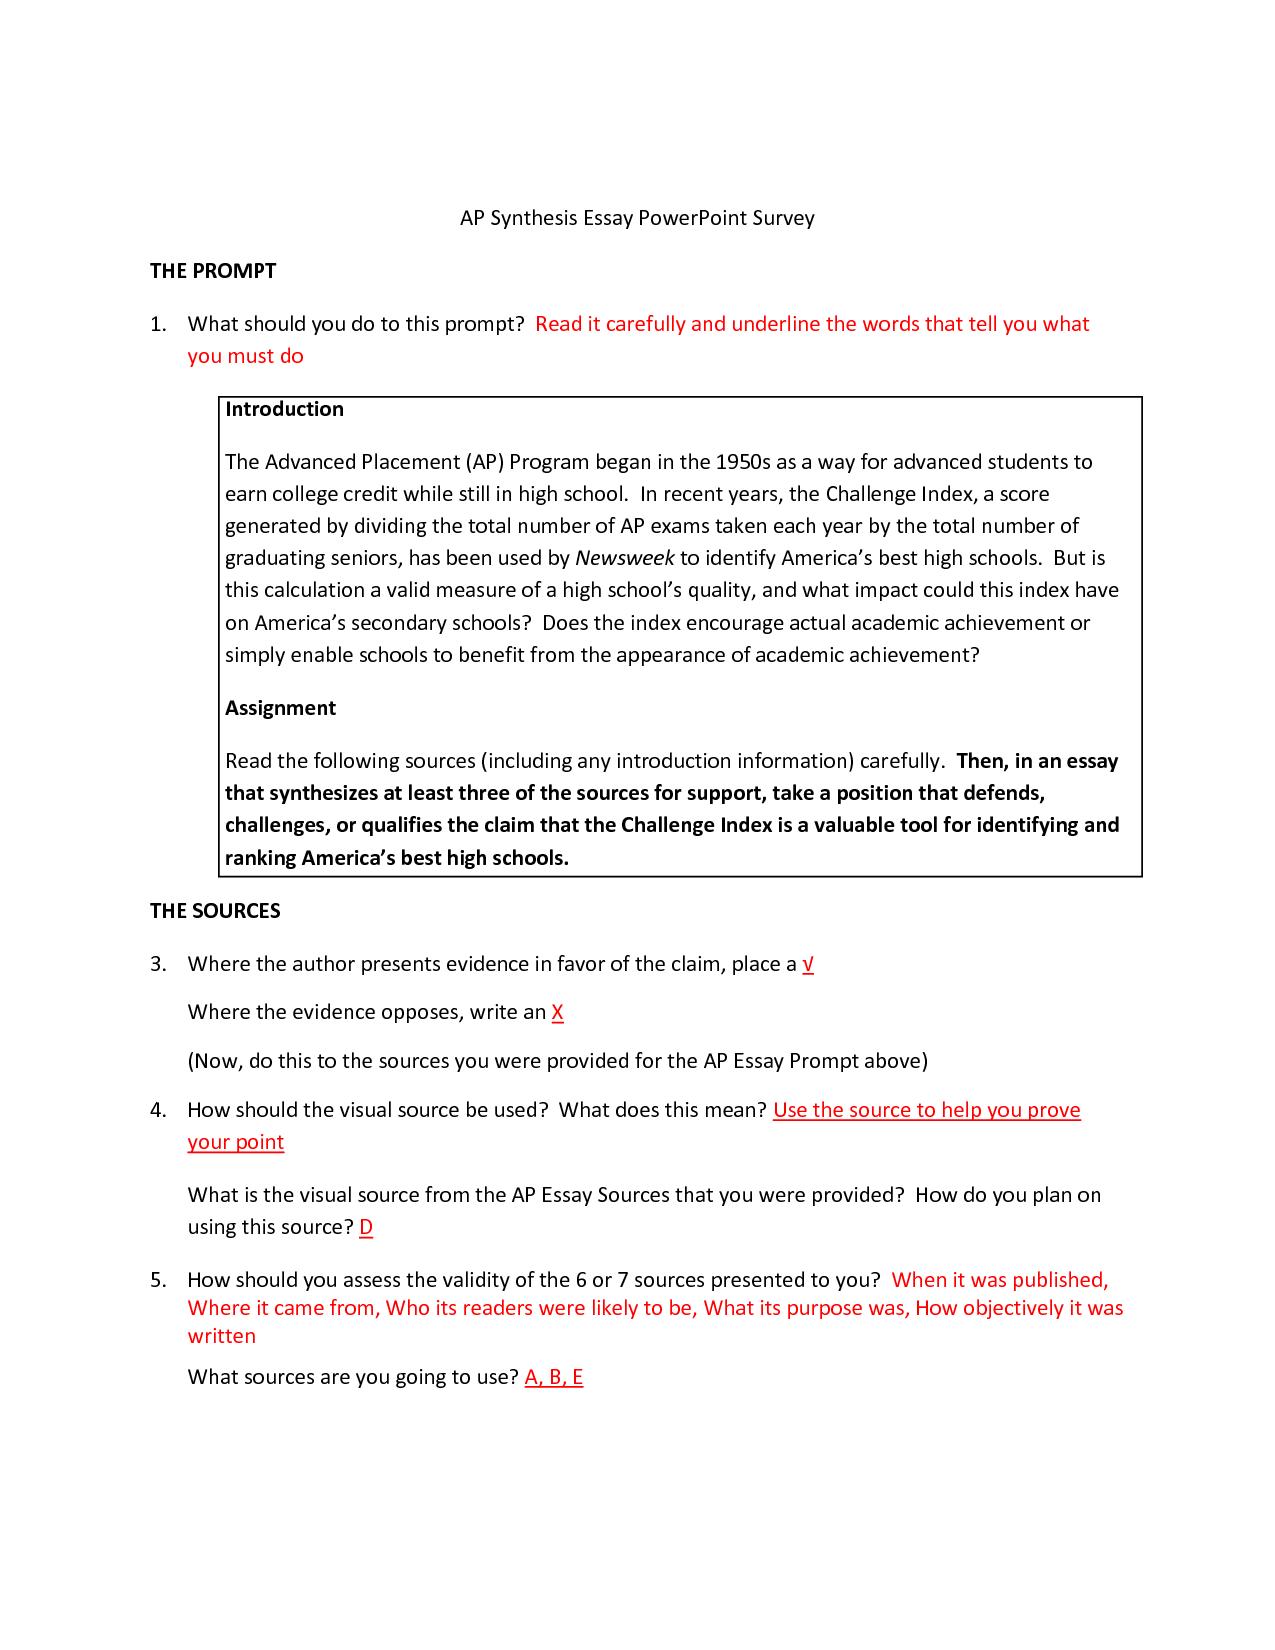 Rewards for grades essay